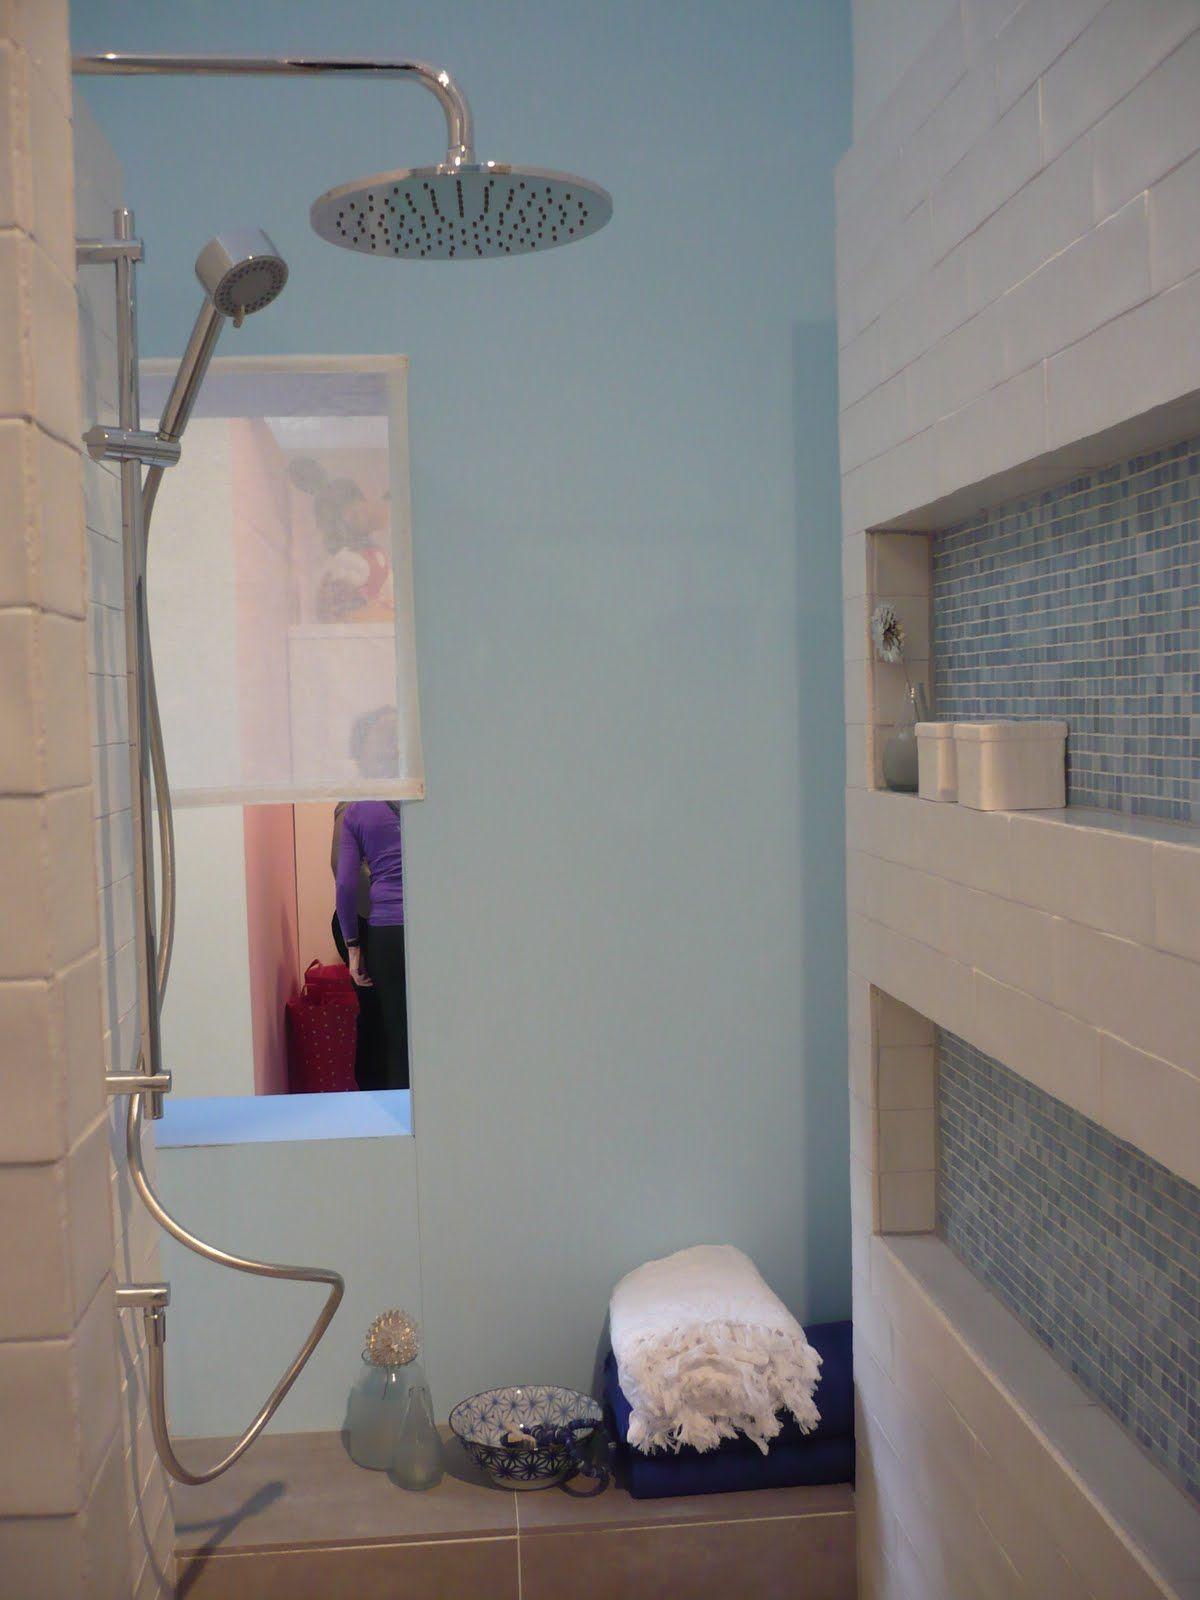 ariadne at home badkamer - Google zoeken | Badkamer | Pinterest